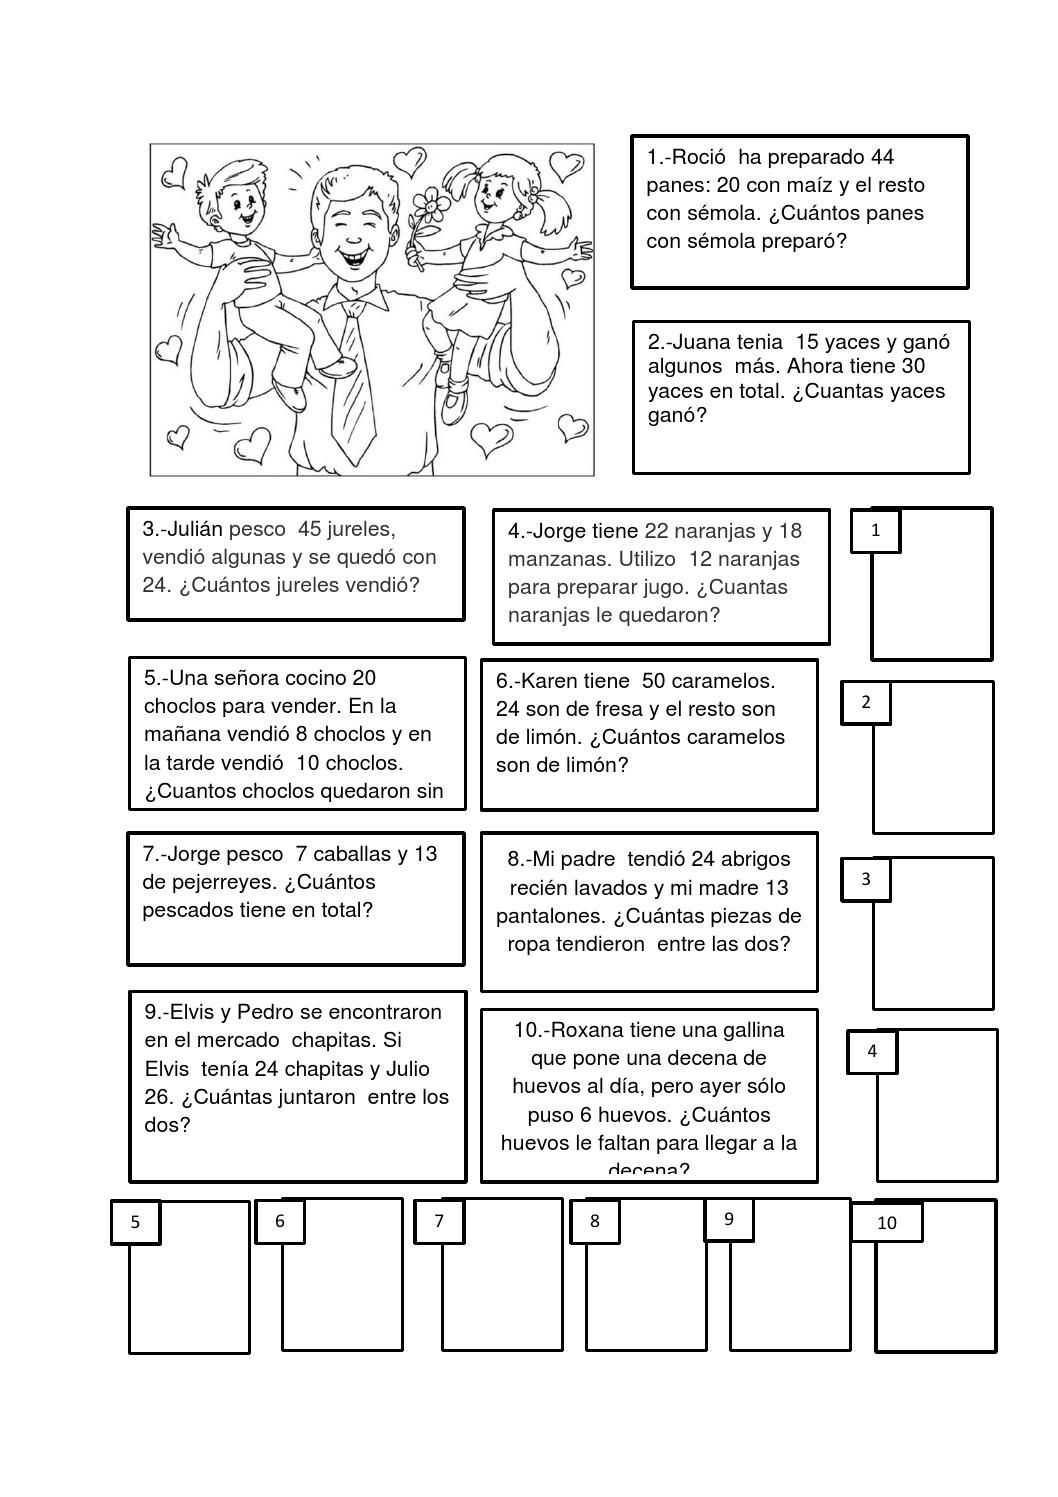 Ficha De Aplicacion De Problemas Matematicos Para Alumnos